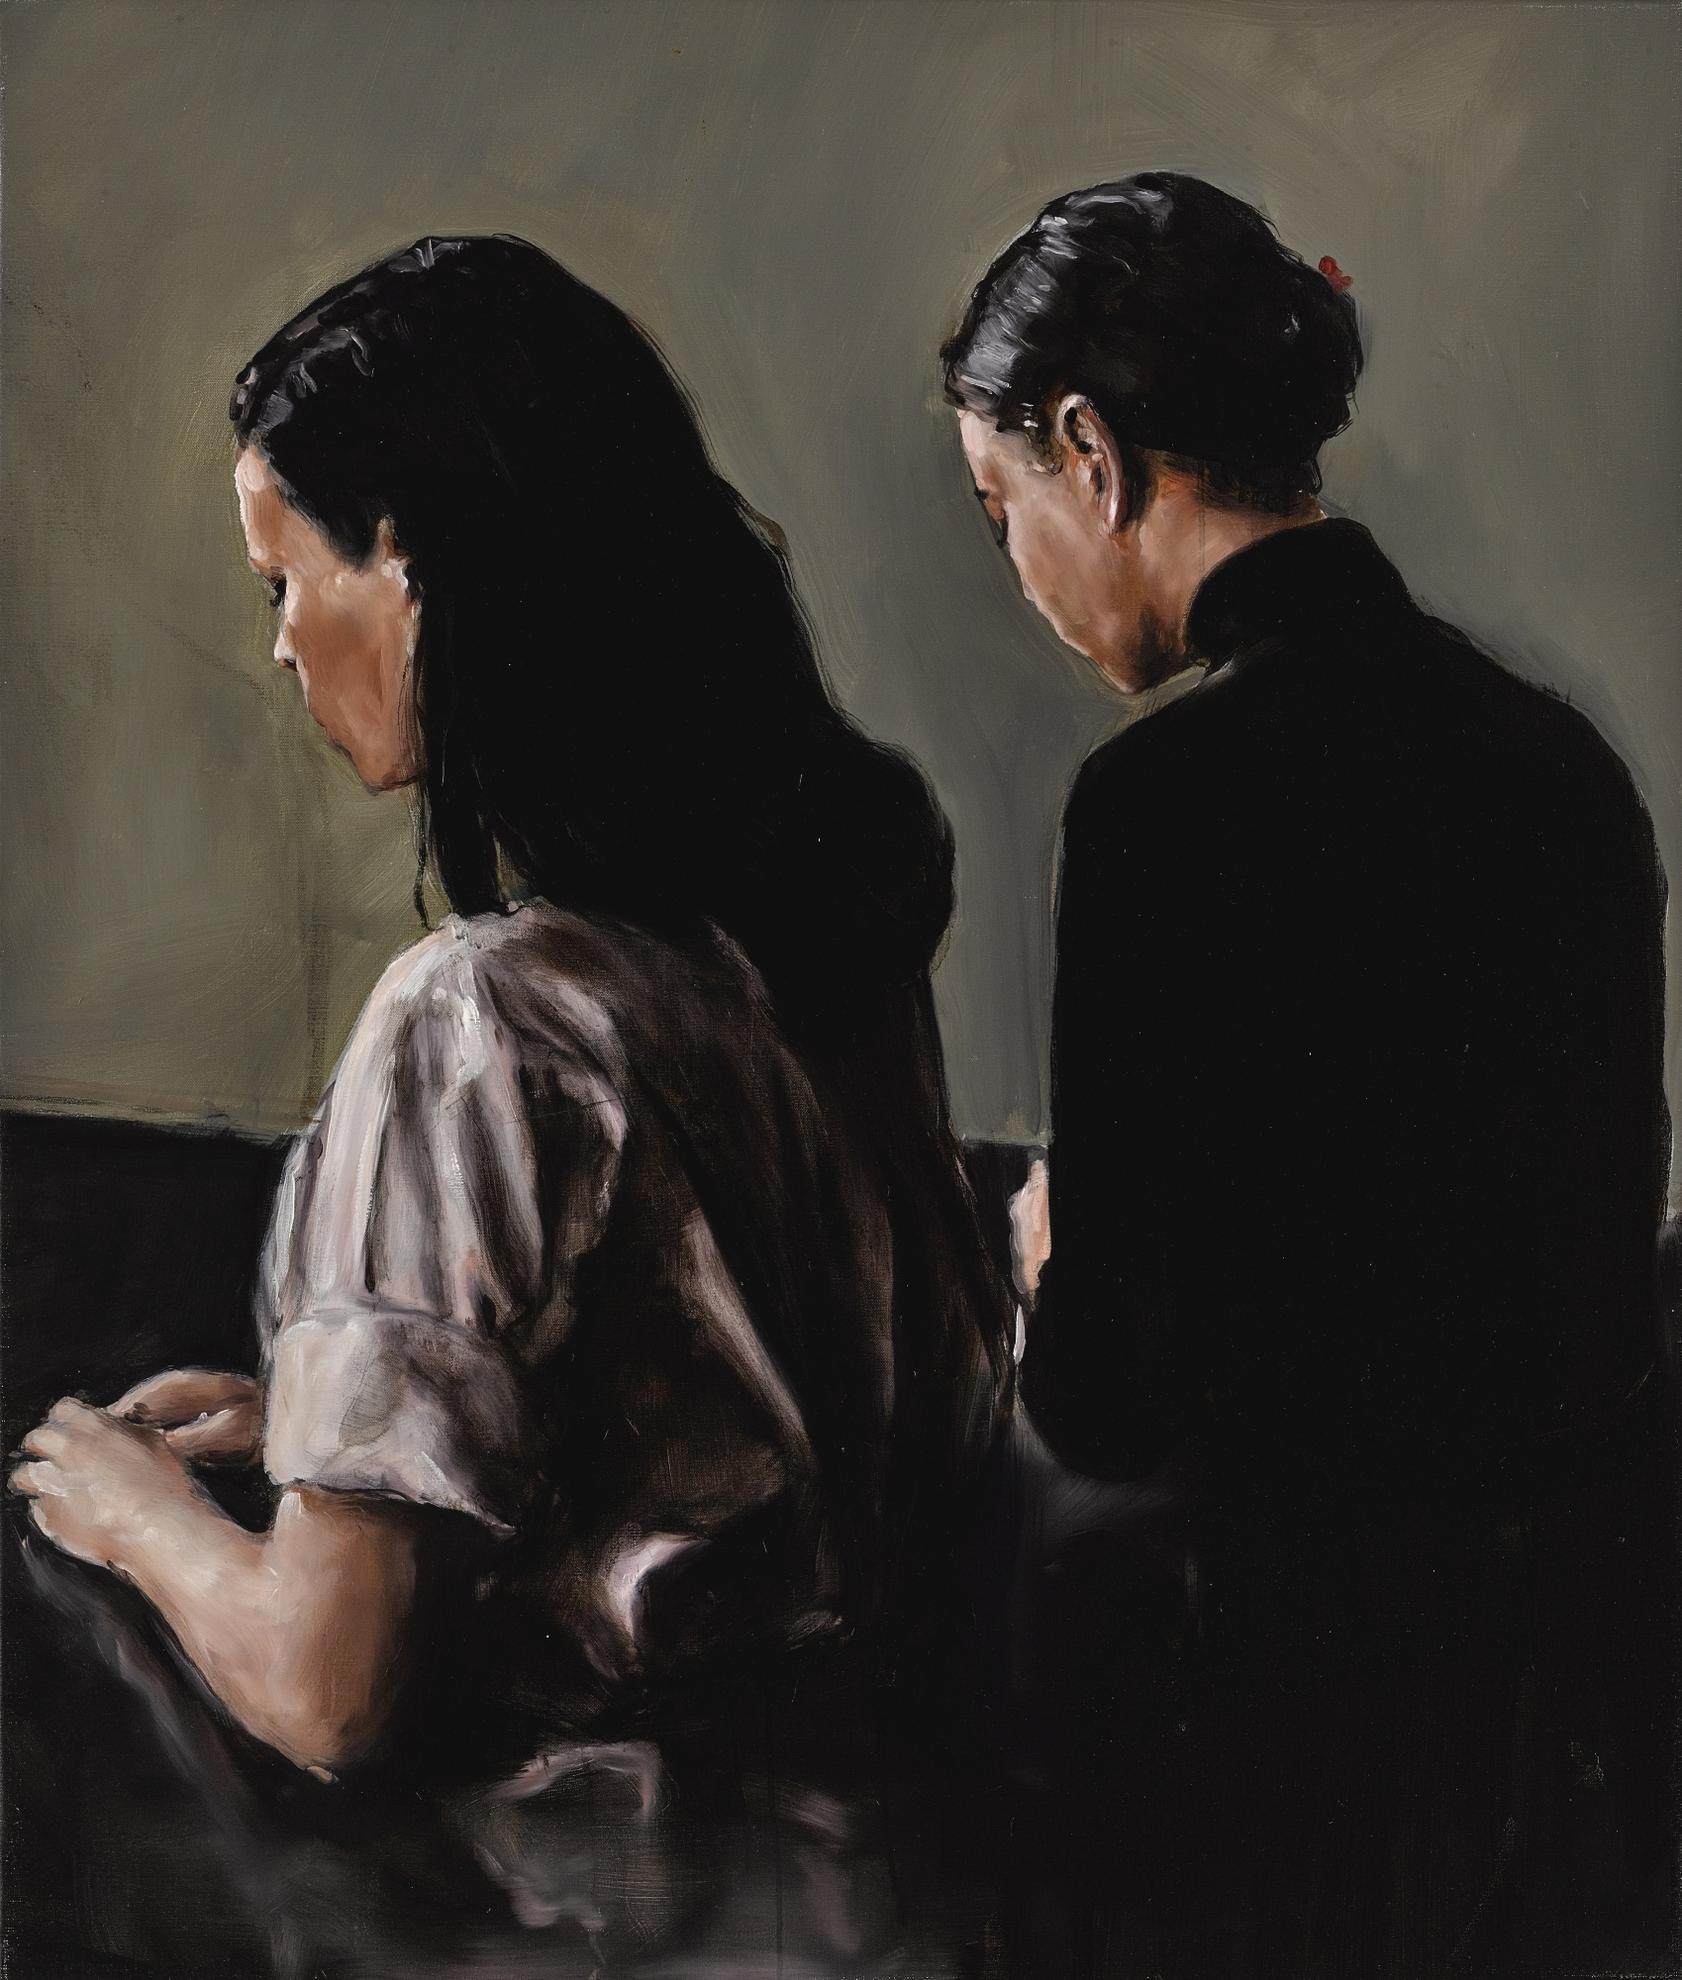 Michael Borremans-Two-2004